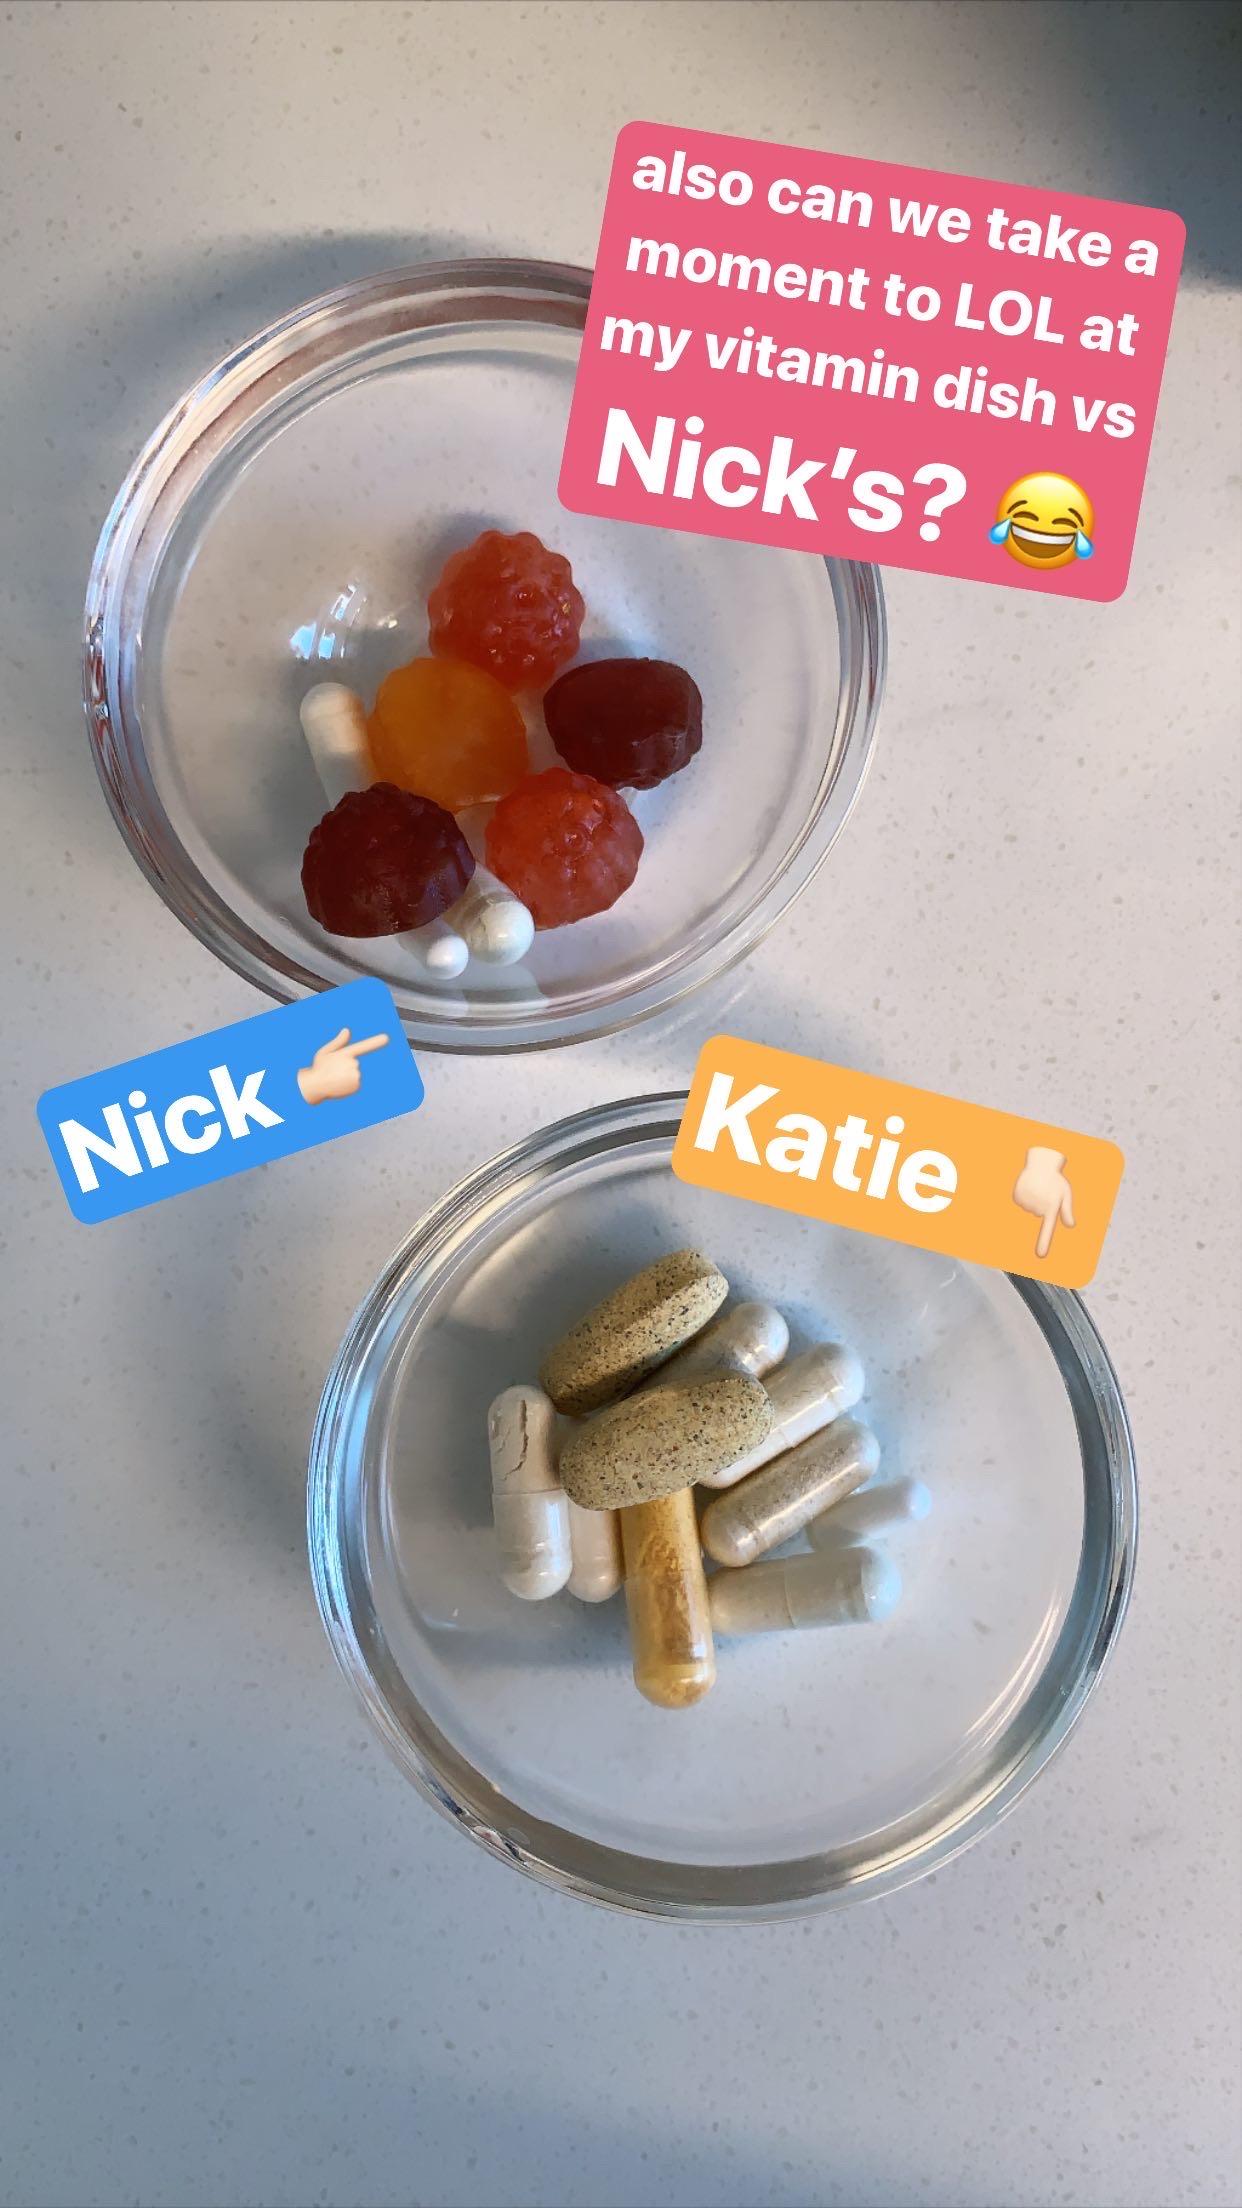 Katies Bliss Vitamins